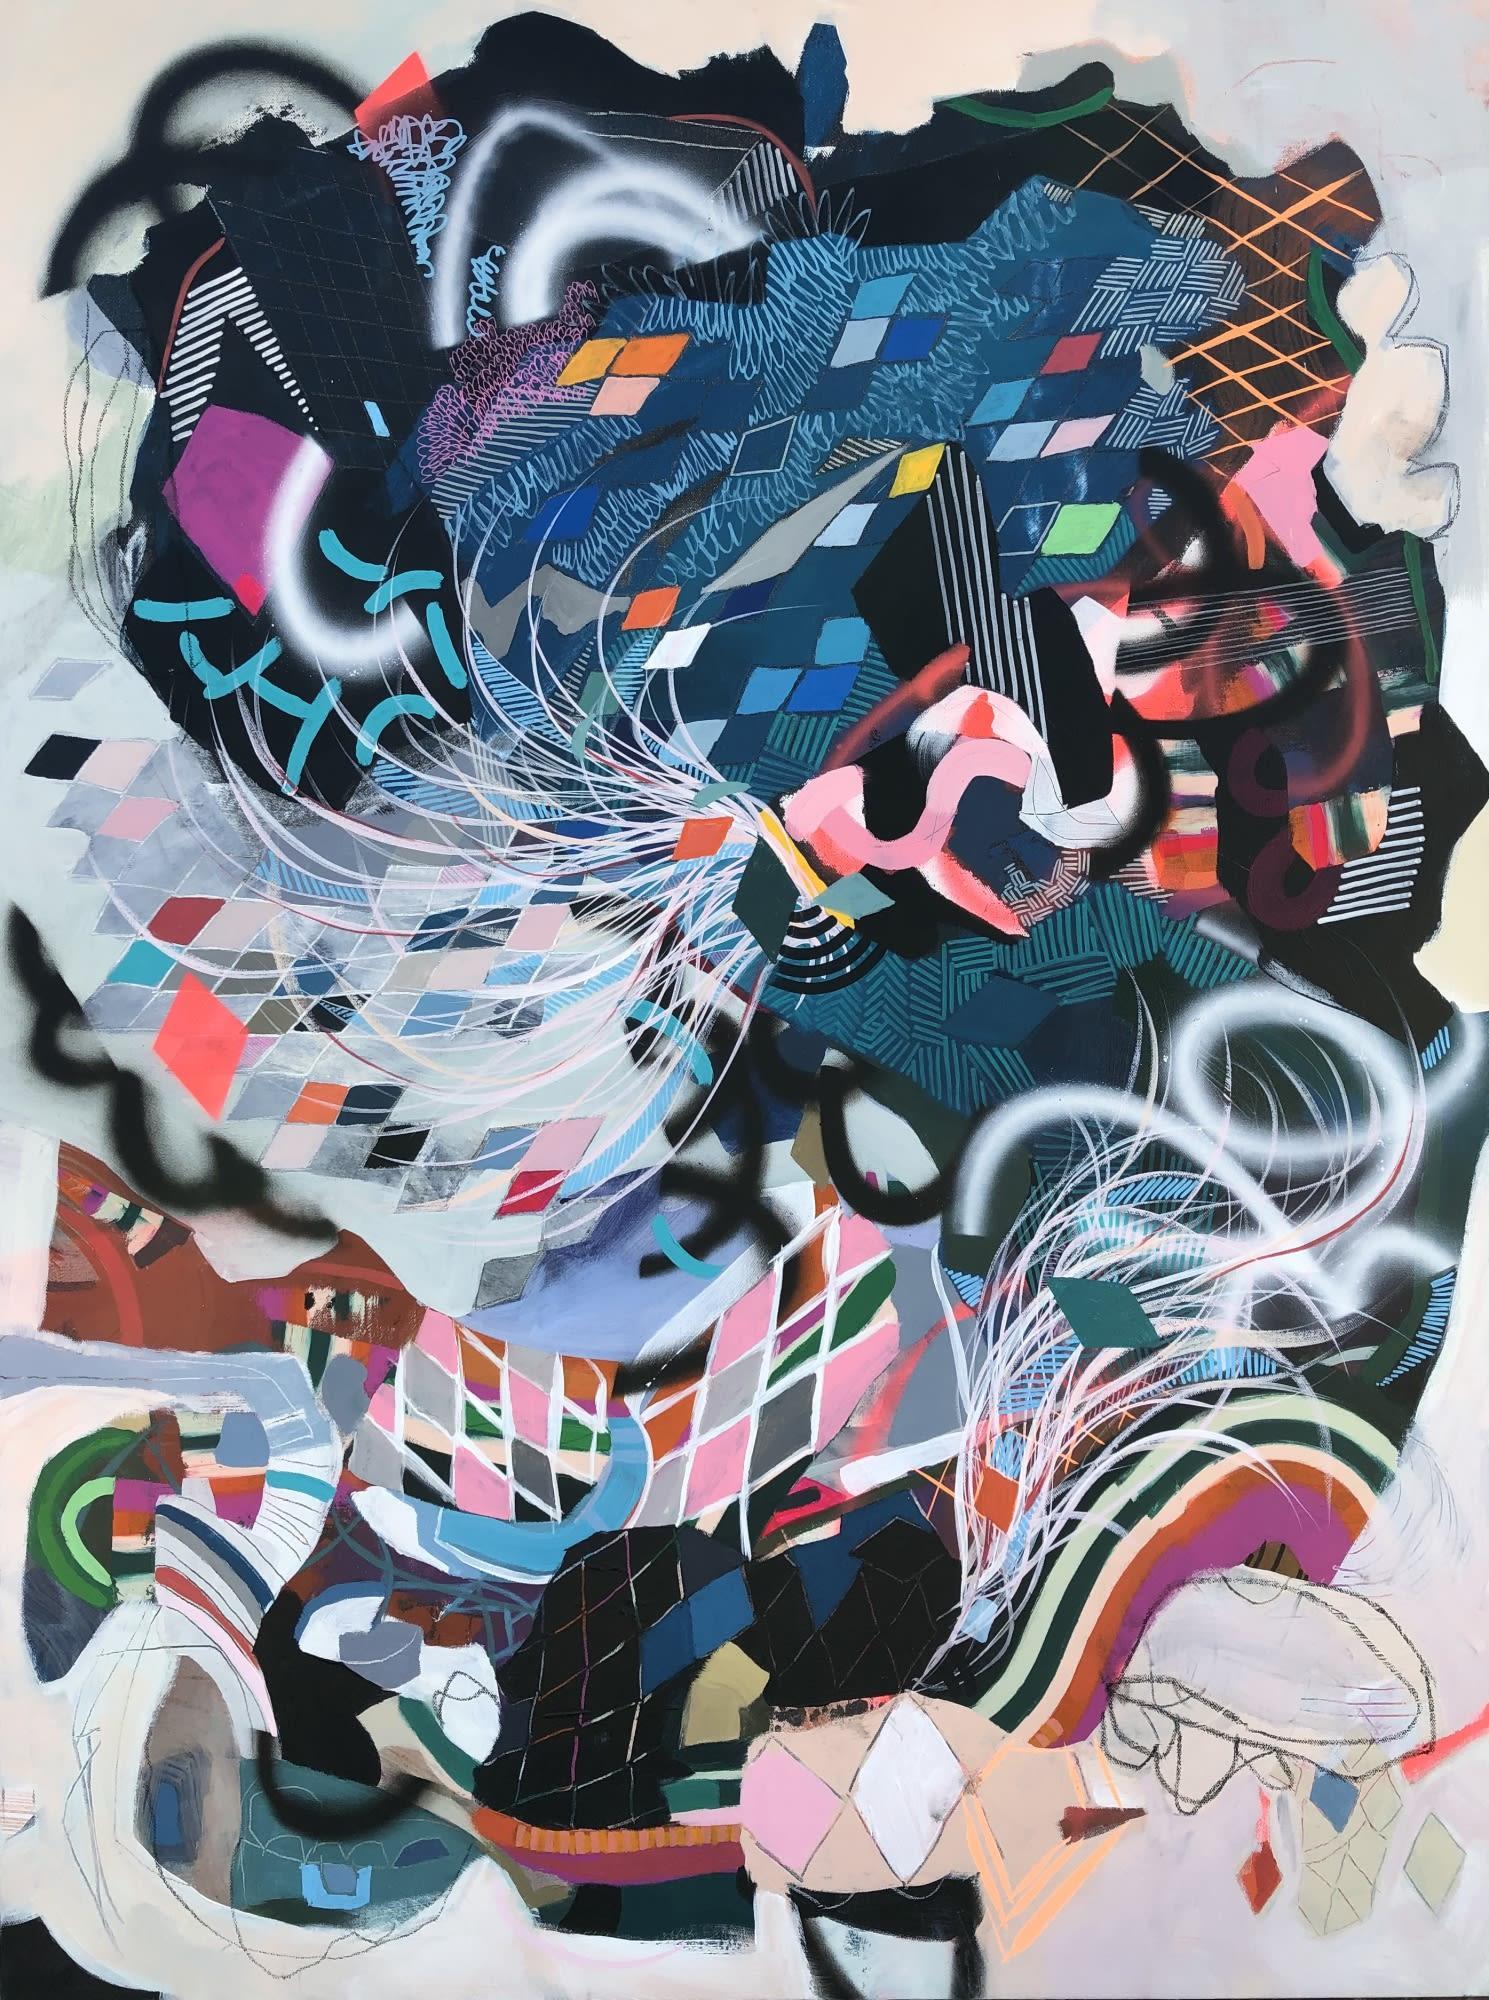 'Tricky Voices' by Christina Sorace MacKinnon at Gallery 133